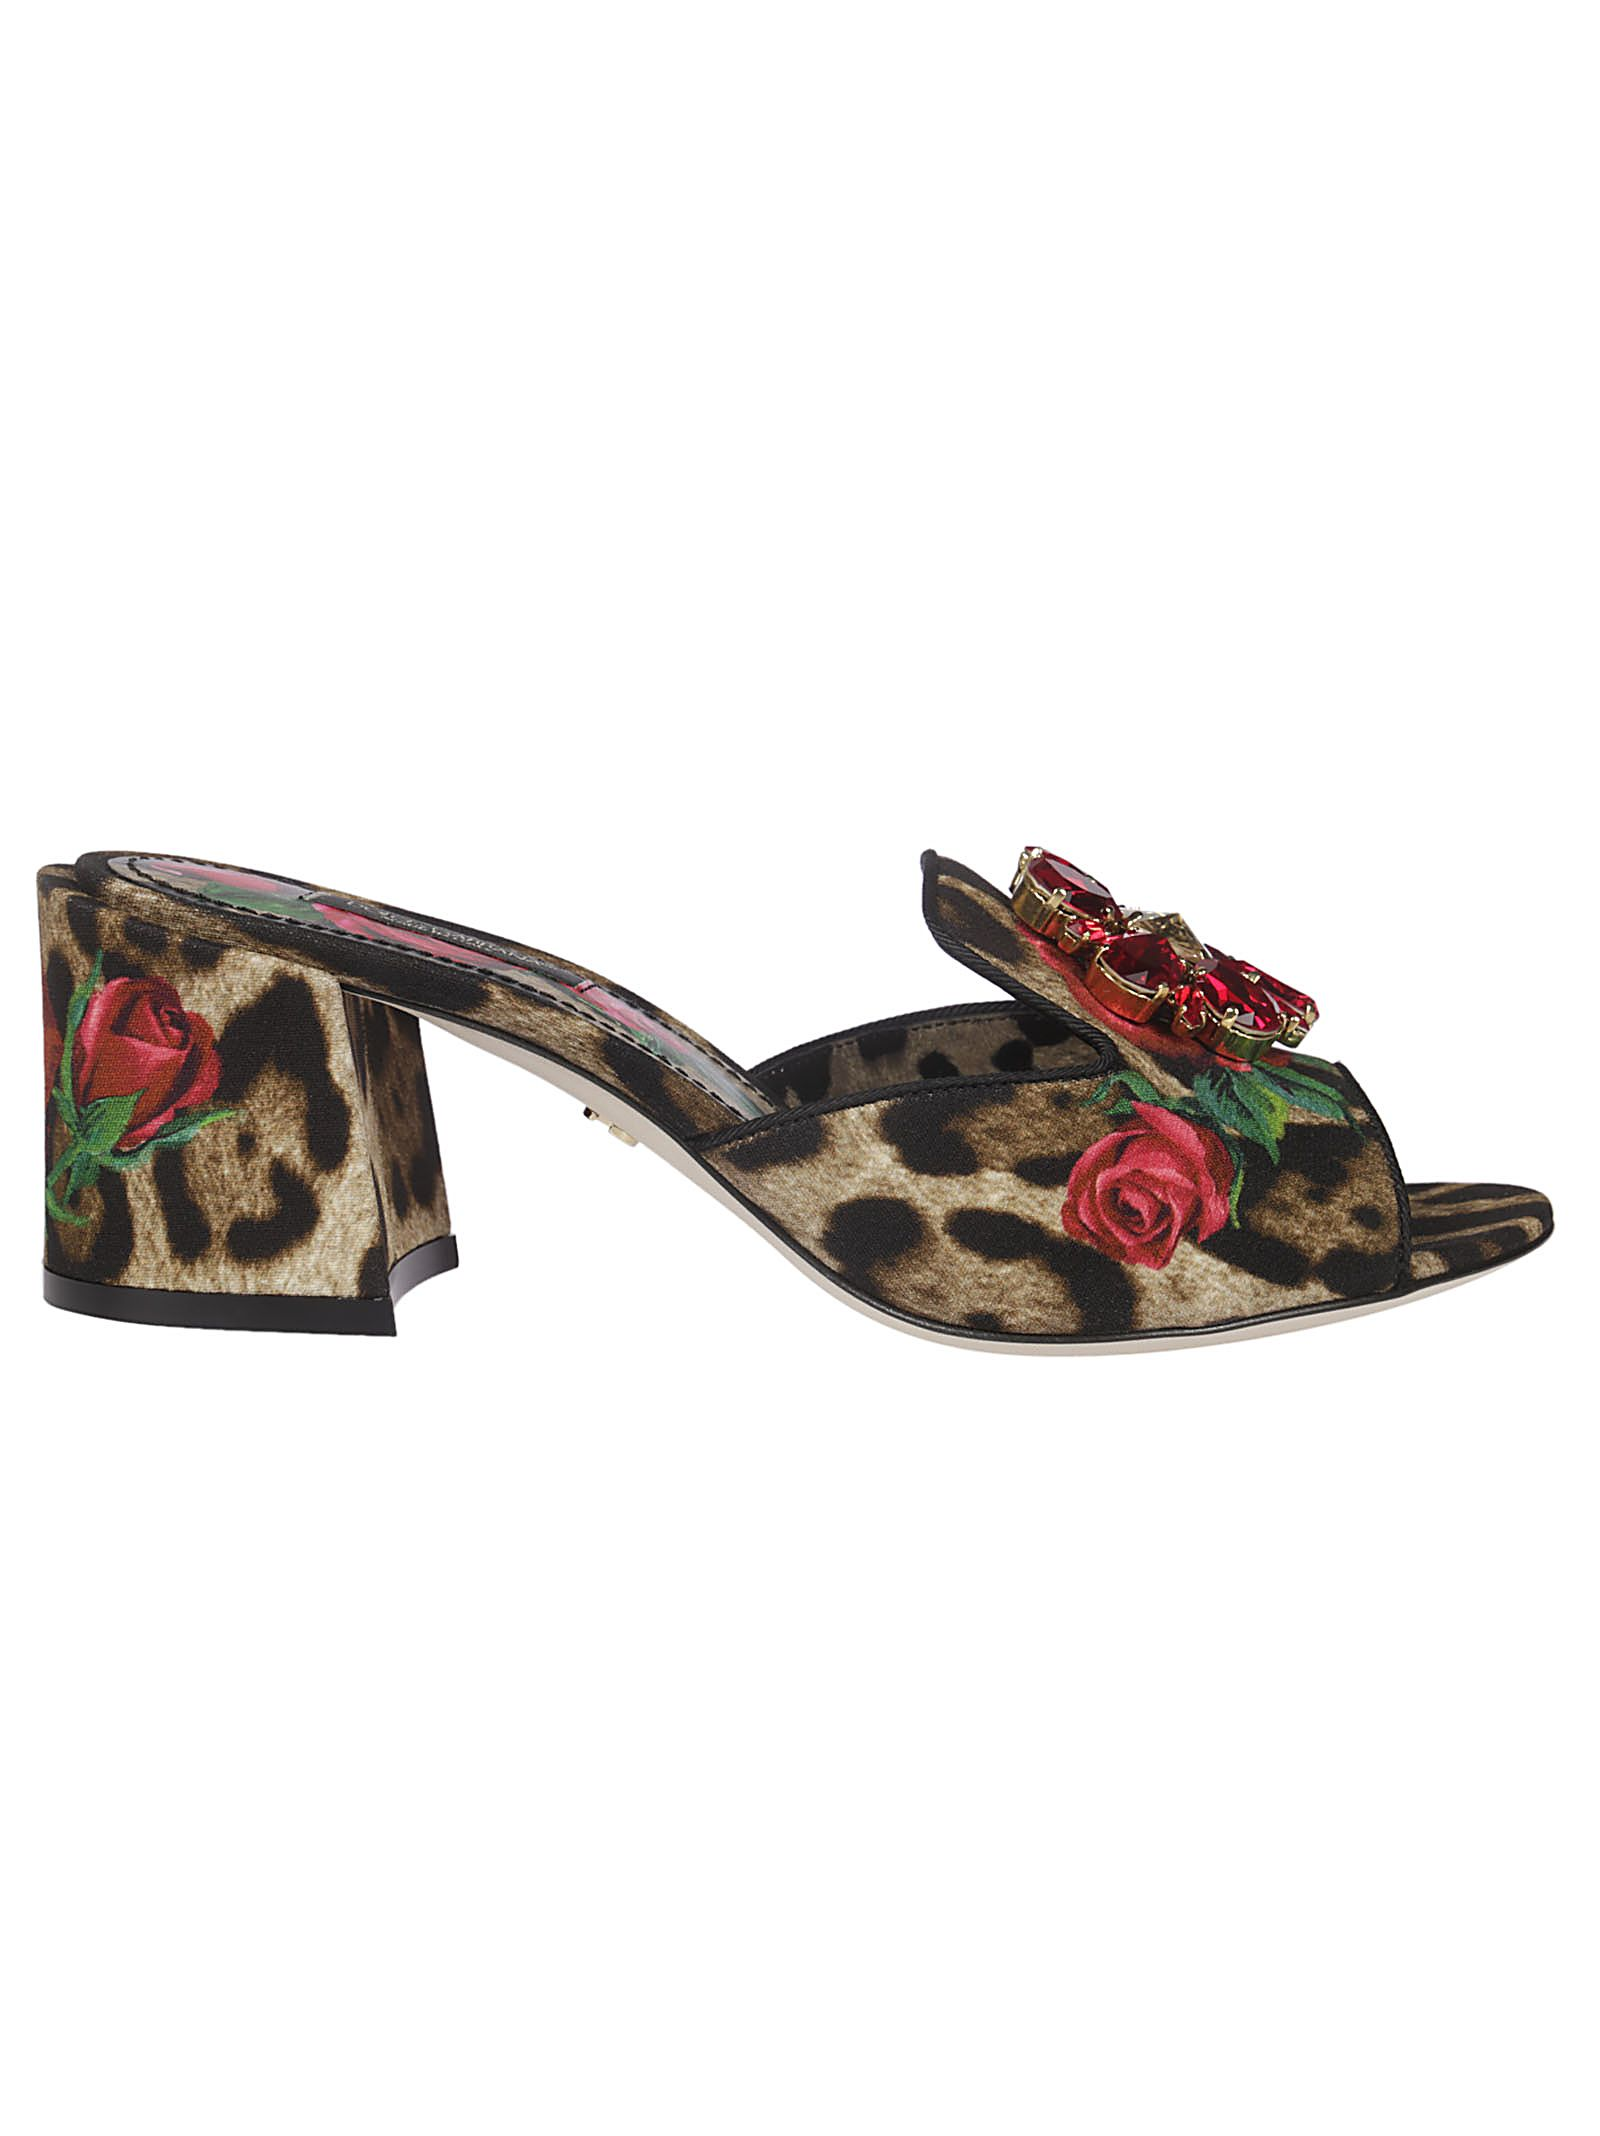 8522052571a Dolce   Gabbana Dolce   Gabbana Leopard And Rose Print Sandals ...